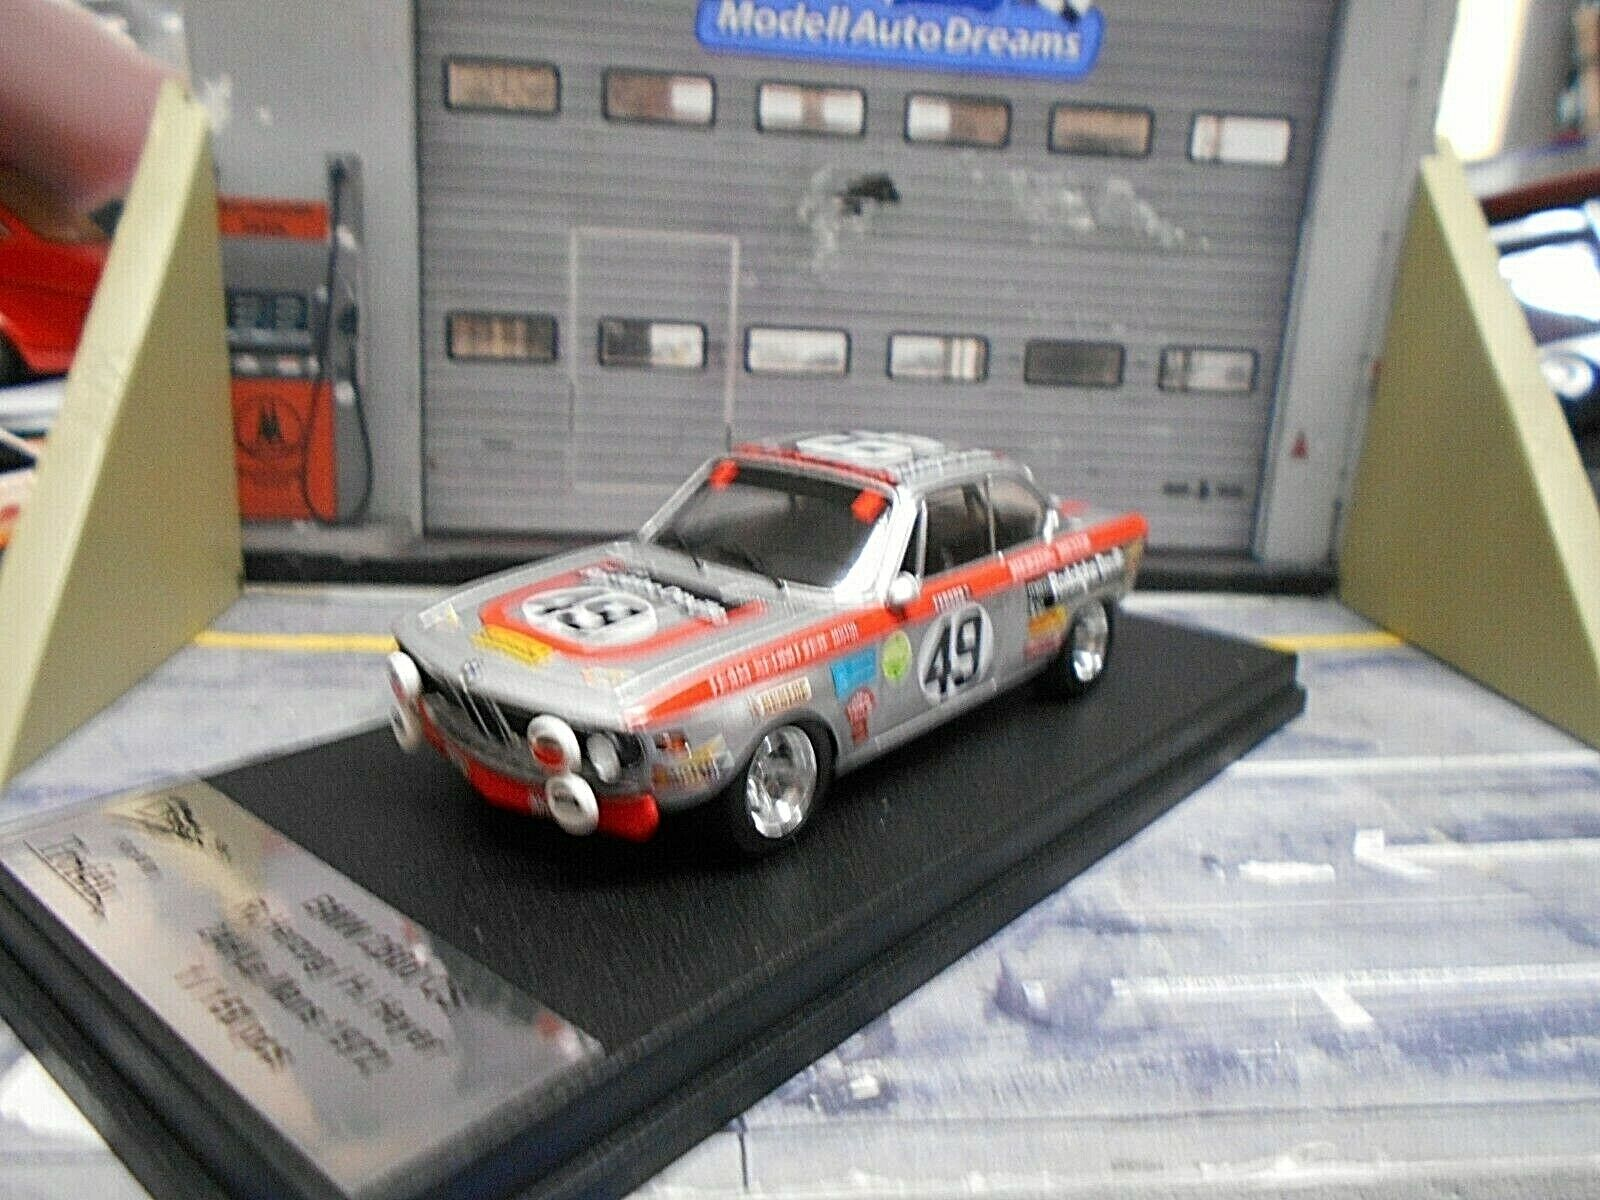 BMW 2800 CS Coupe 24h Le Mans 1972  49 Heyer Herzog Motul Schnitzer Trofeu 1 43